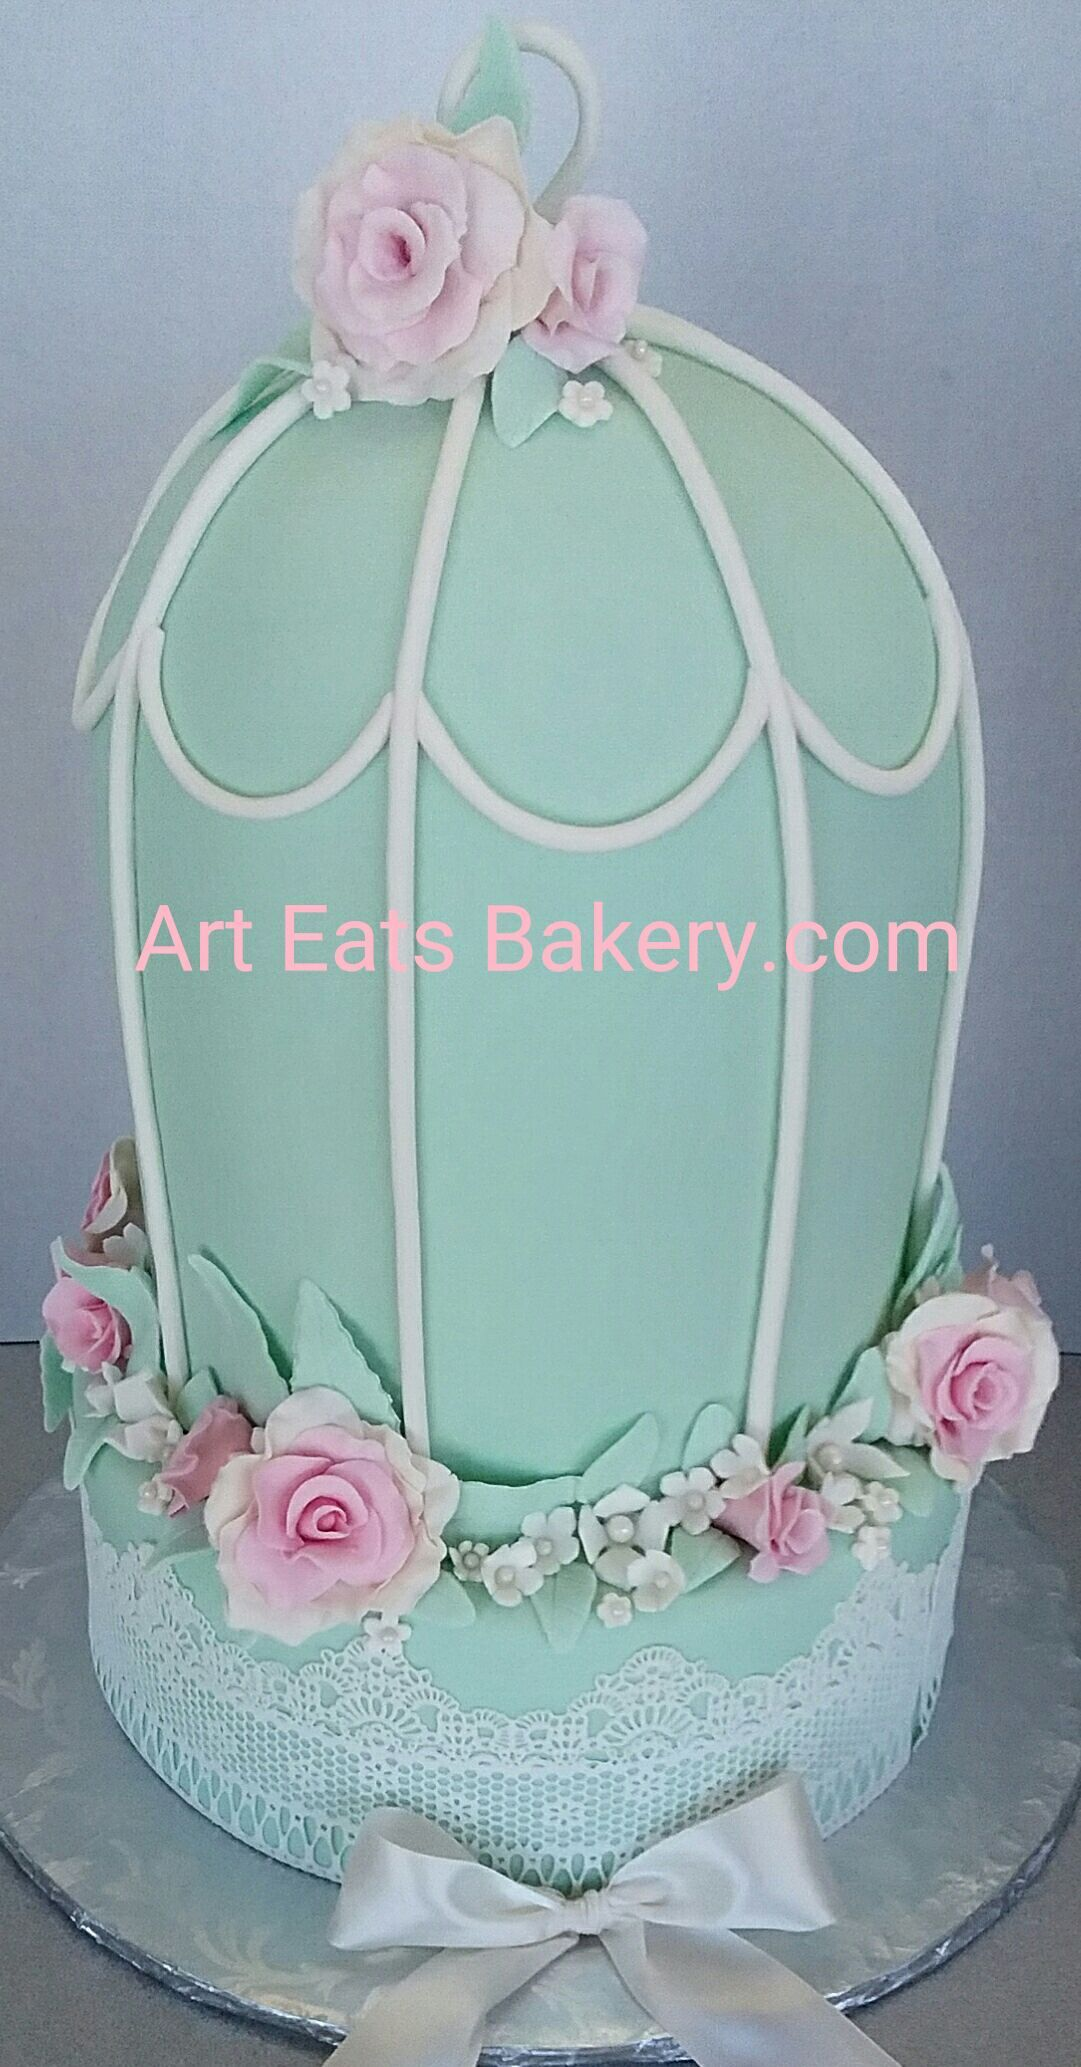 Custom unique baby shower cake designs on Pinterest